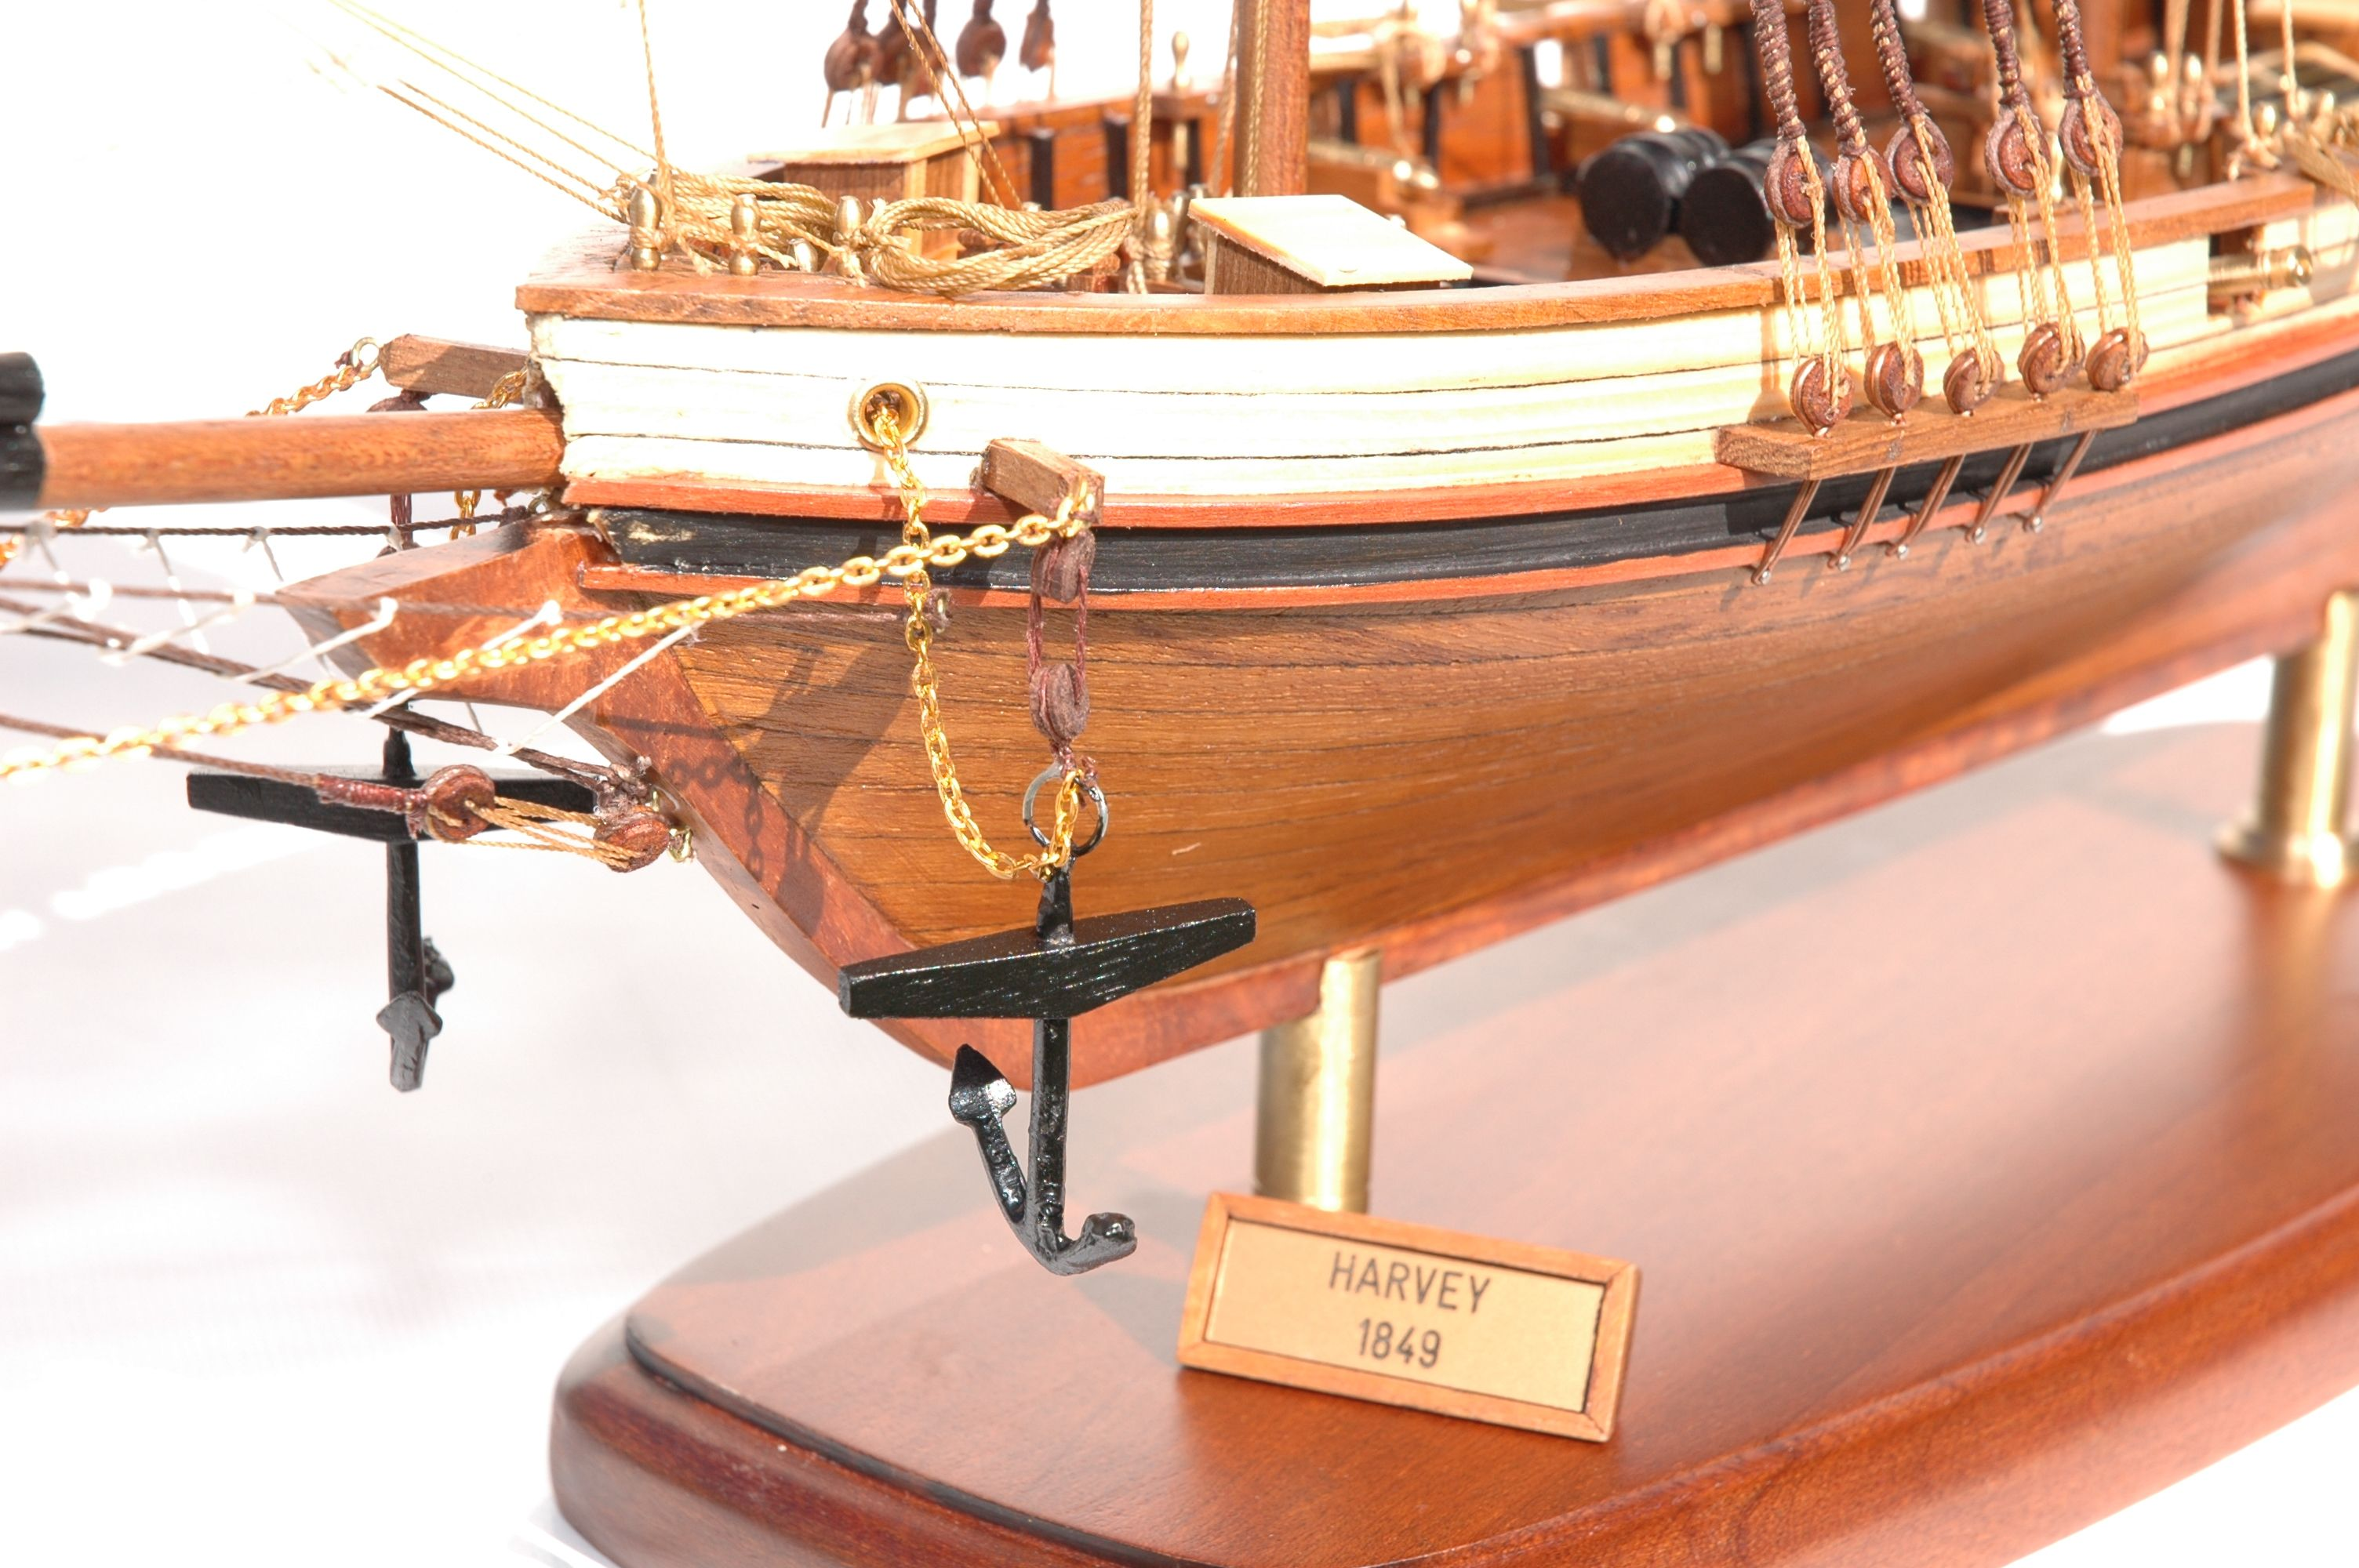 514-8304-Harvey-Model-Boat-Superior-Range